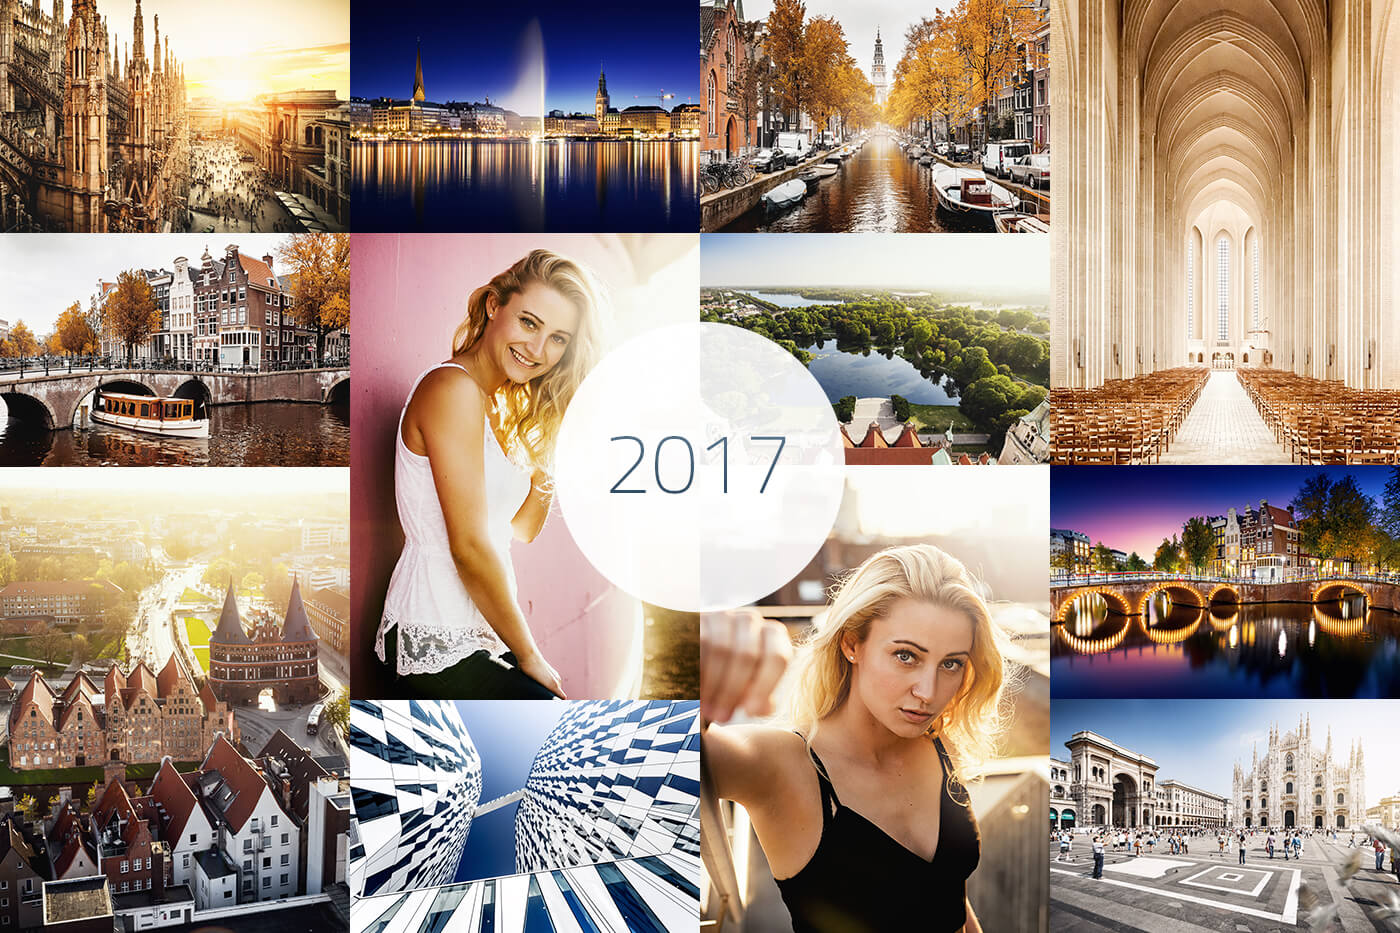 Fotograf aus Hannover Sebastian Grote - Best of 2017